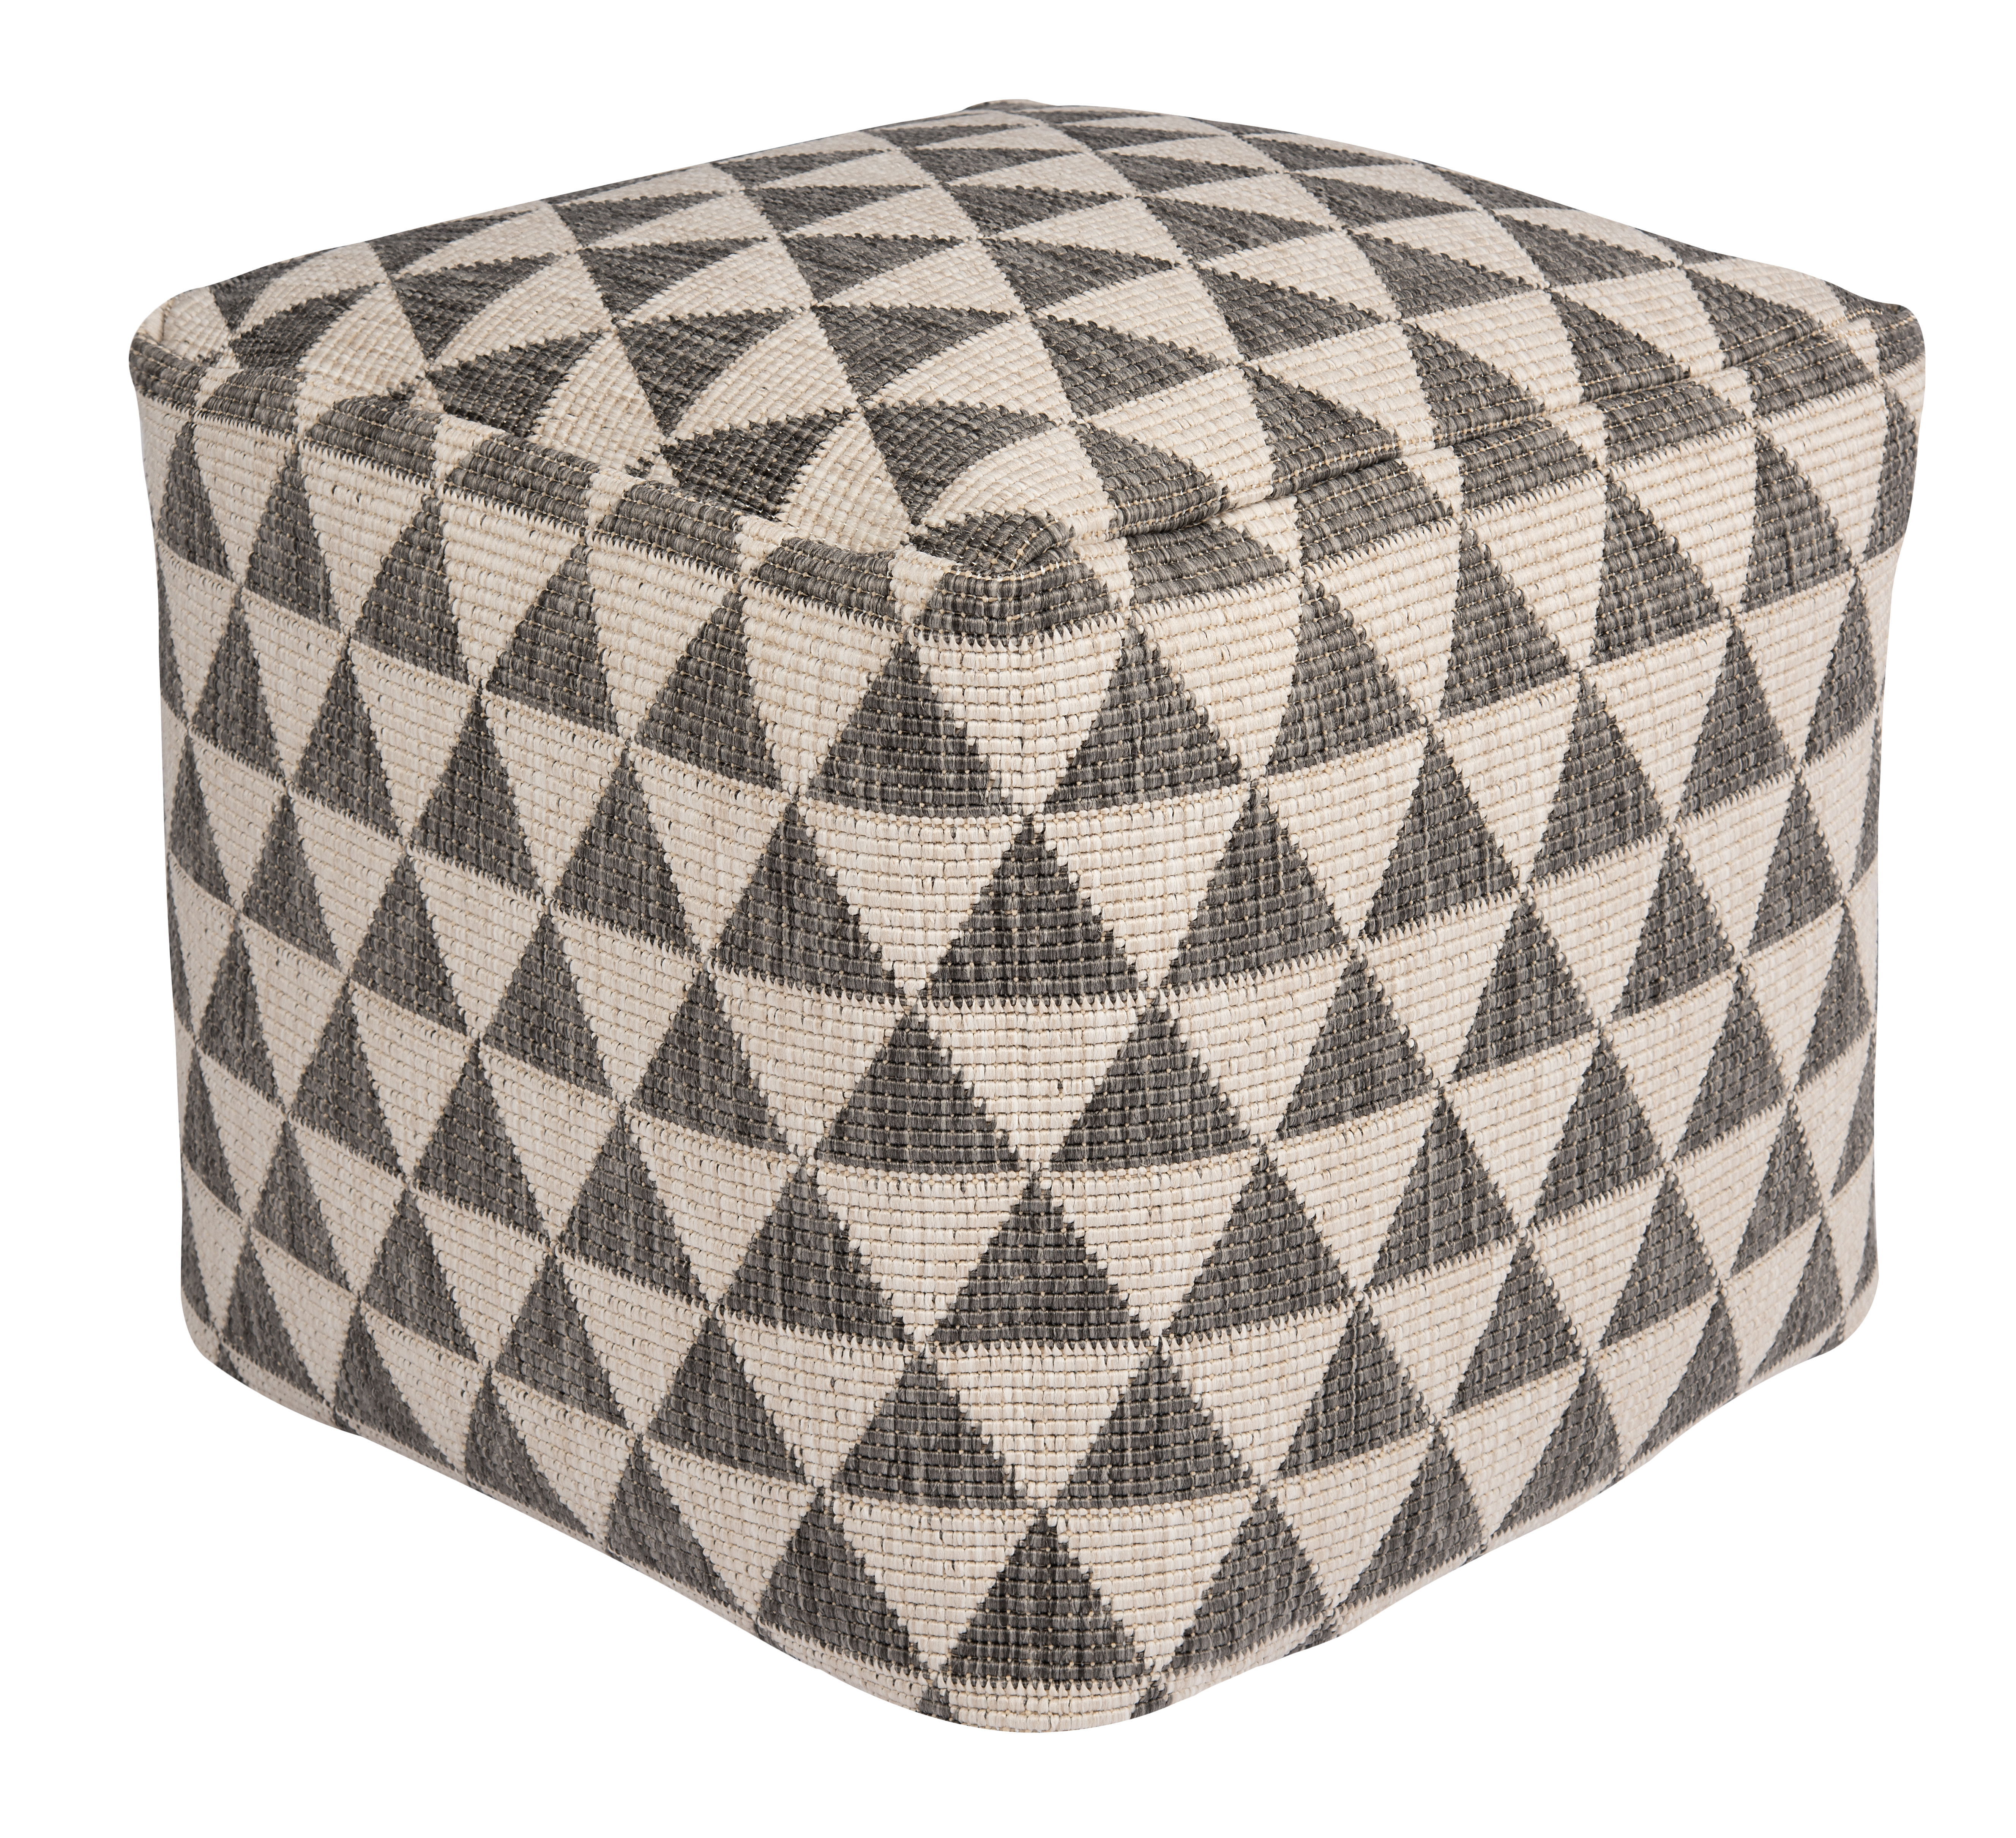 Bougari - Hanse Home koberce Venkovní sedací vak Kalahari Silver 103824 - 48 x 48 x 42 cm cm